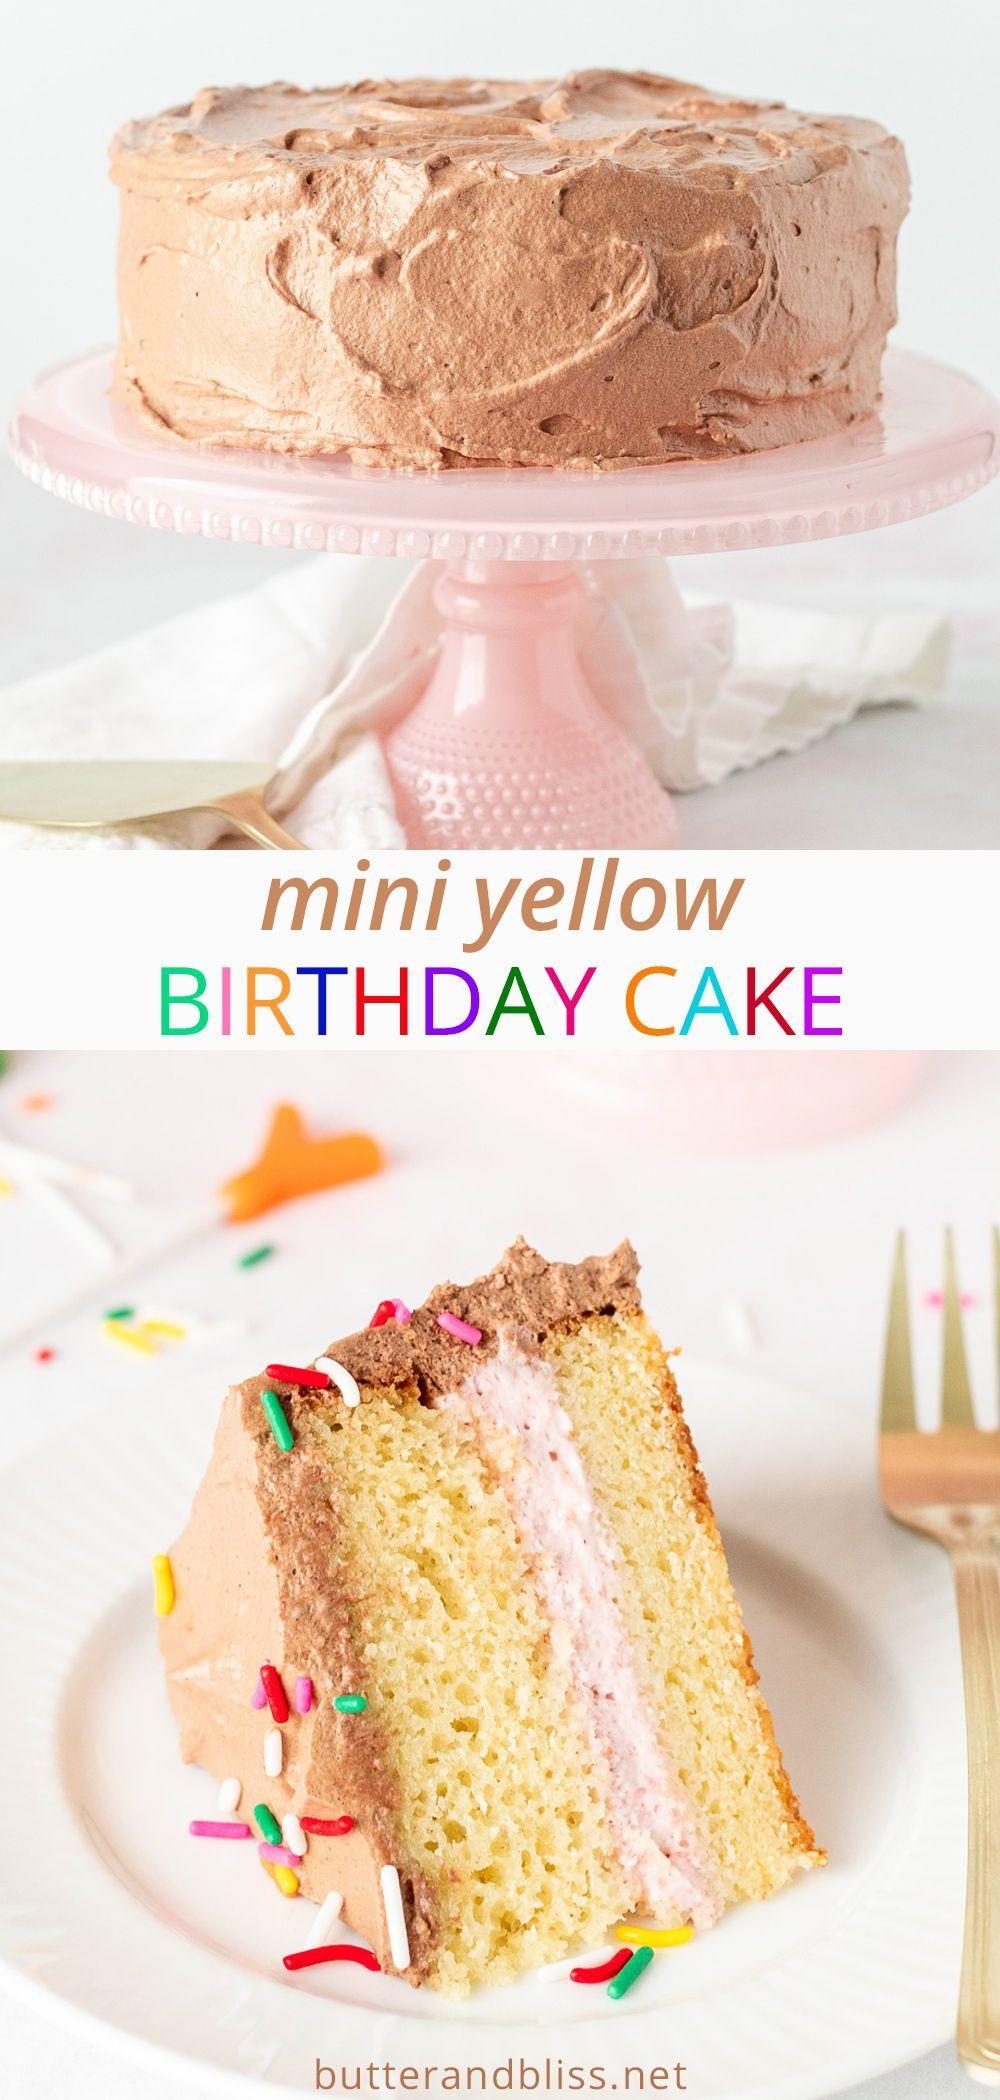 Classic Mini Yellow Cake Neapolitan Cake Butter And Bliss Recipe In 2020 Cake Yellow Cake Yellow Birthday Cakes